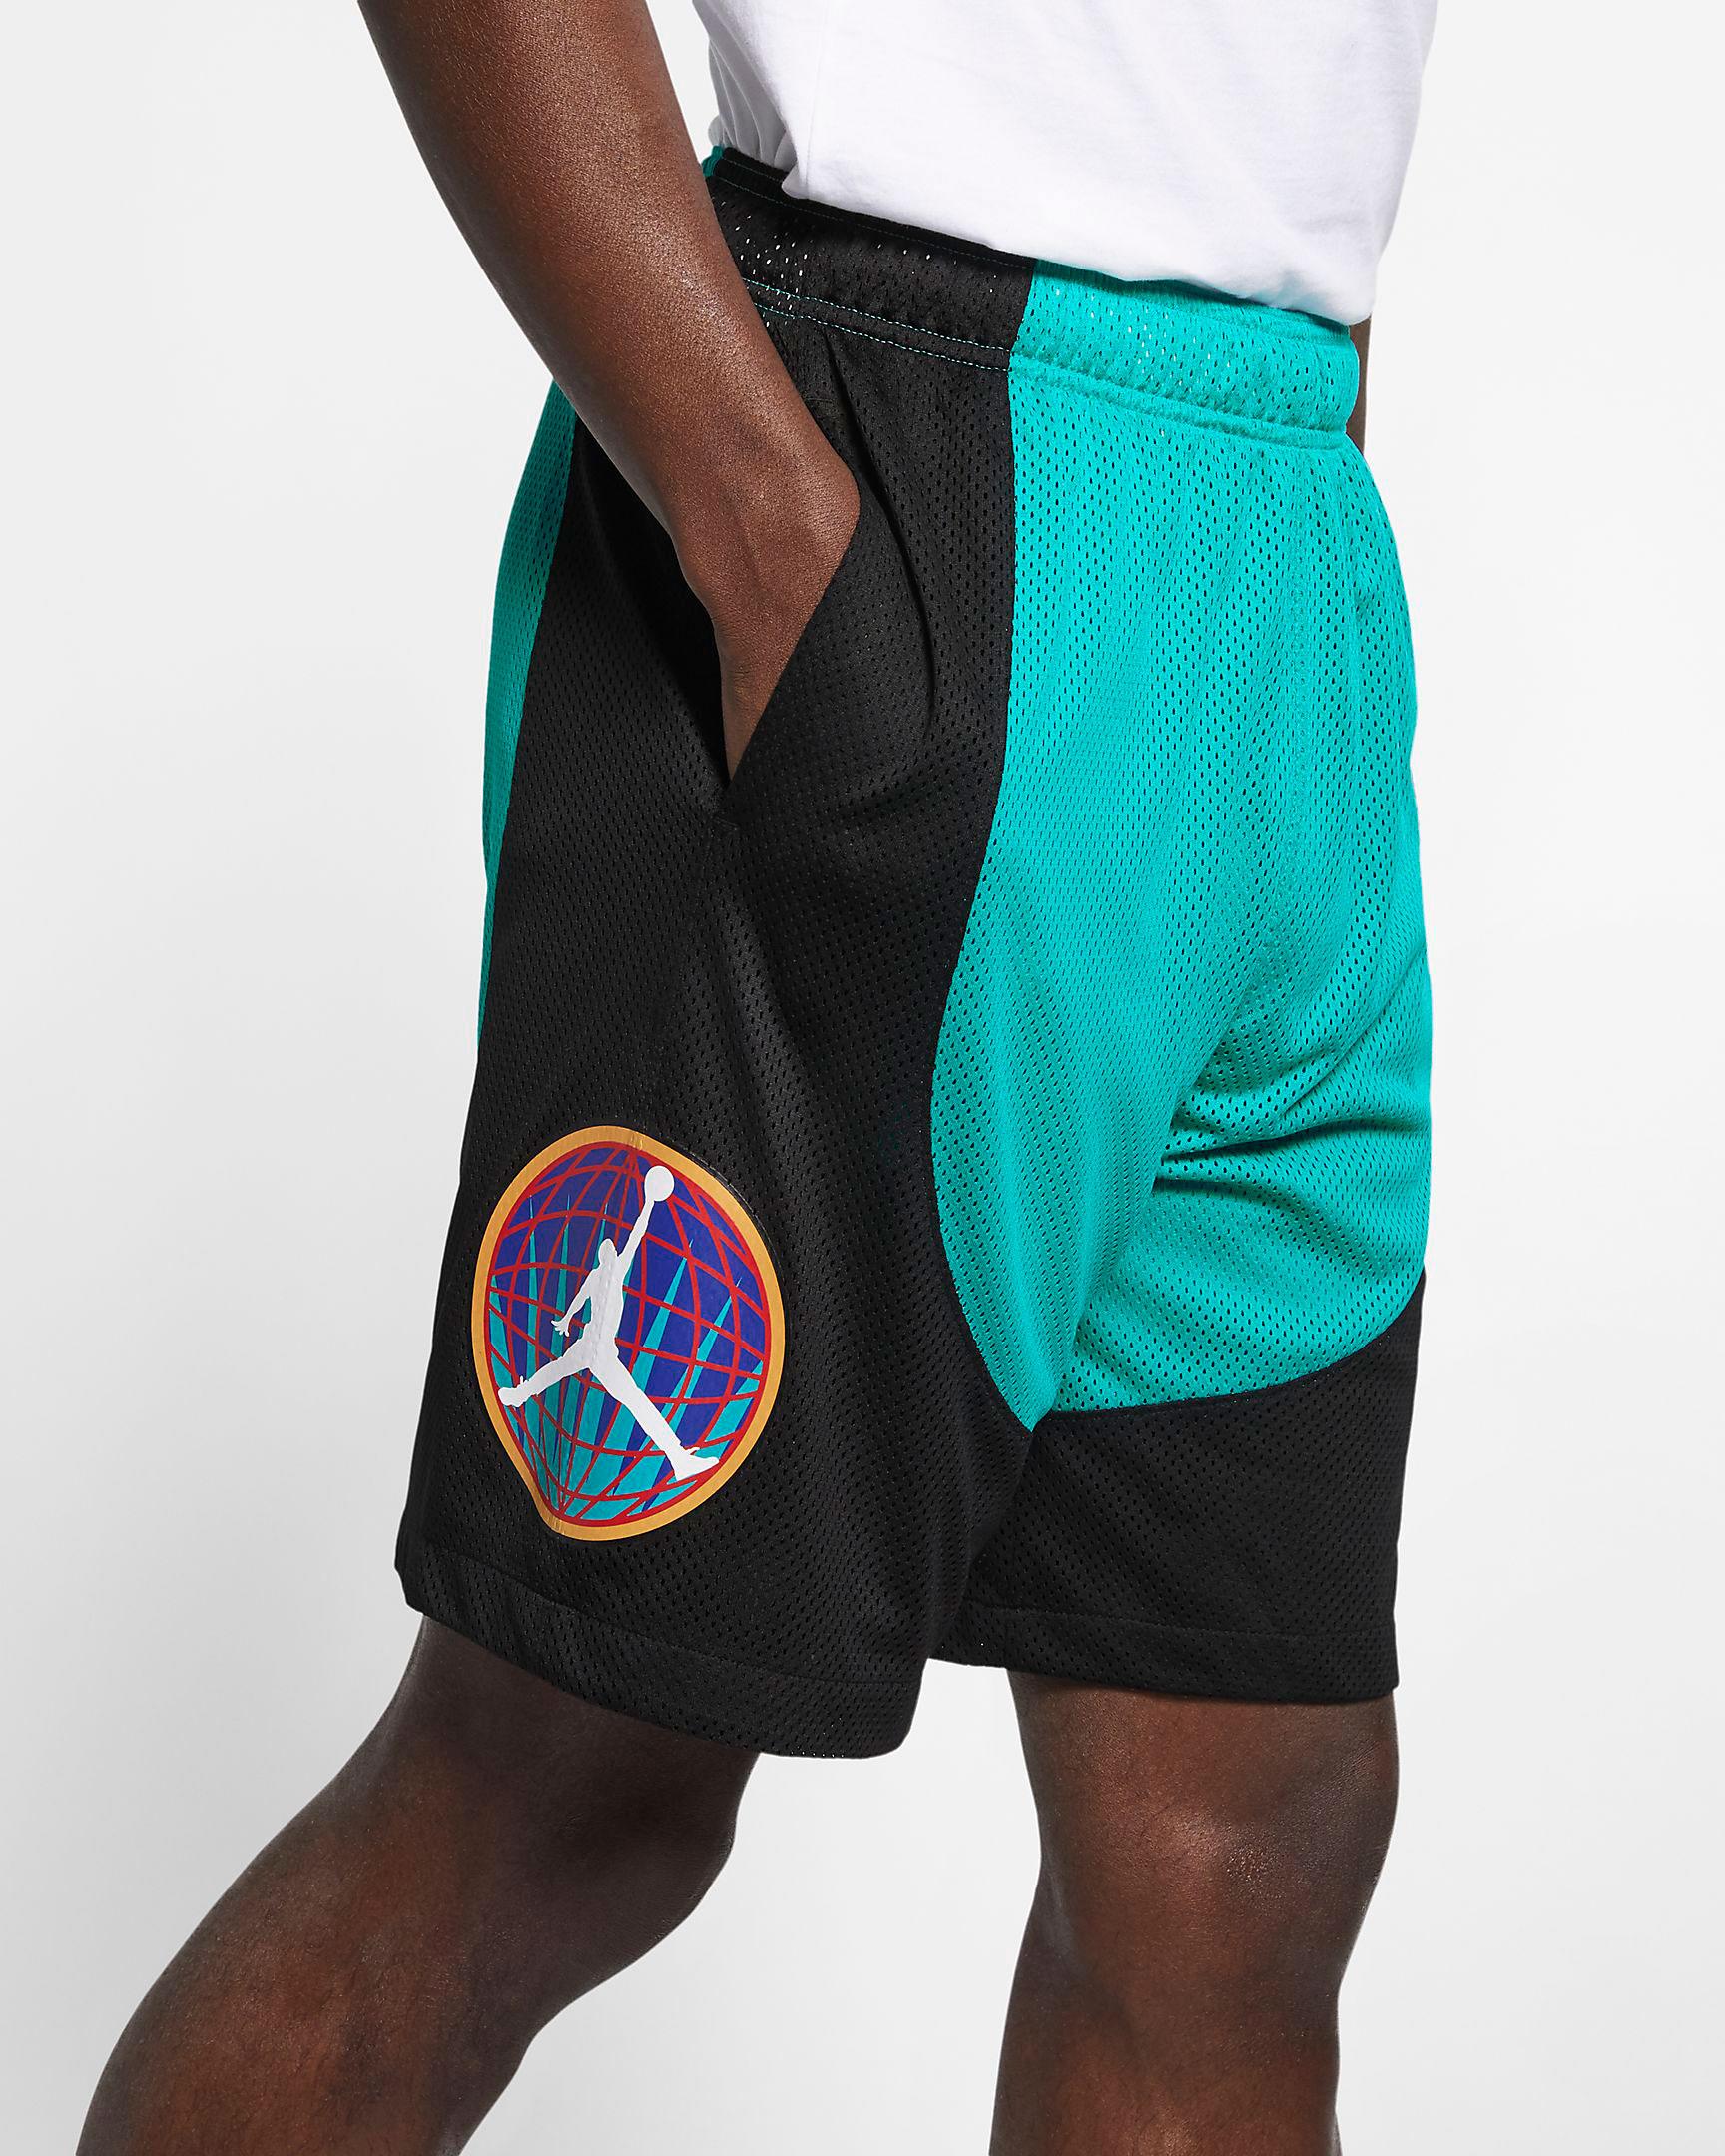 shorts-to-match-jordan-5-alternate-grape